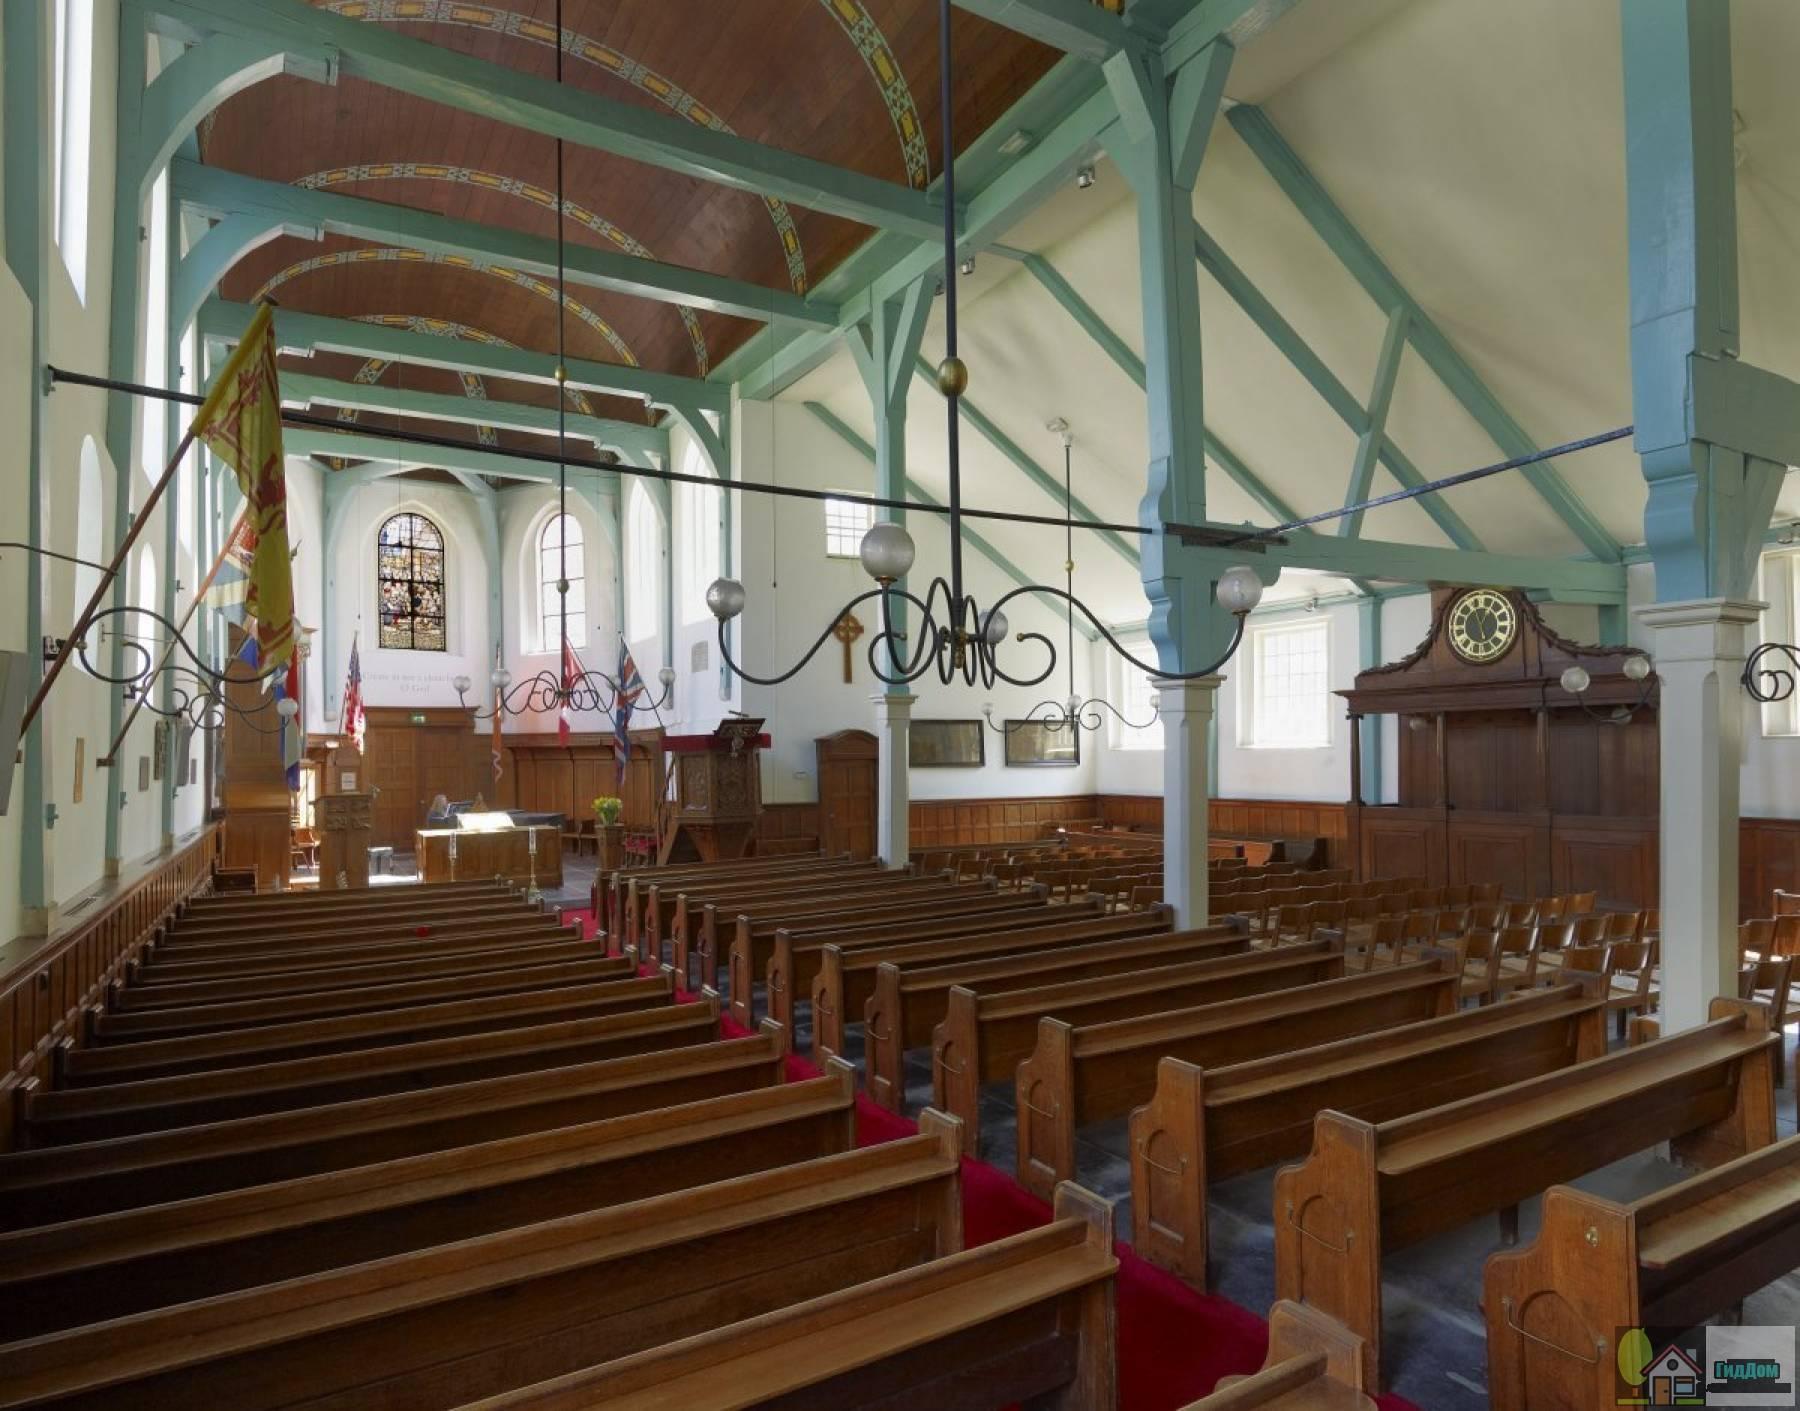 (Engelse presbyteriaanse kerk, oorspronkelijk begijnhofkapel)